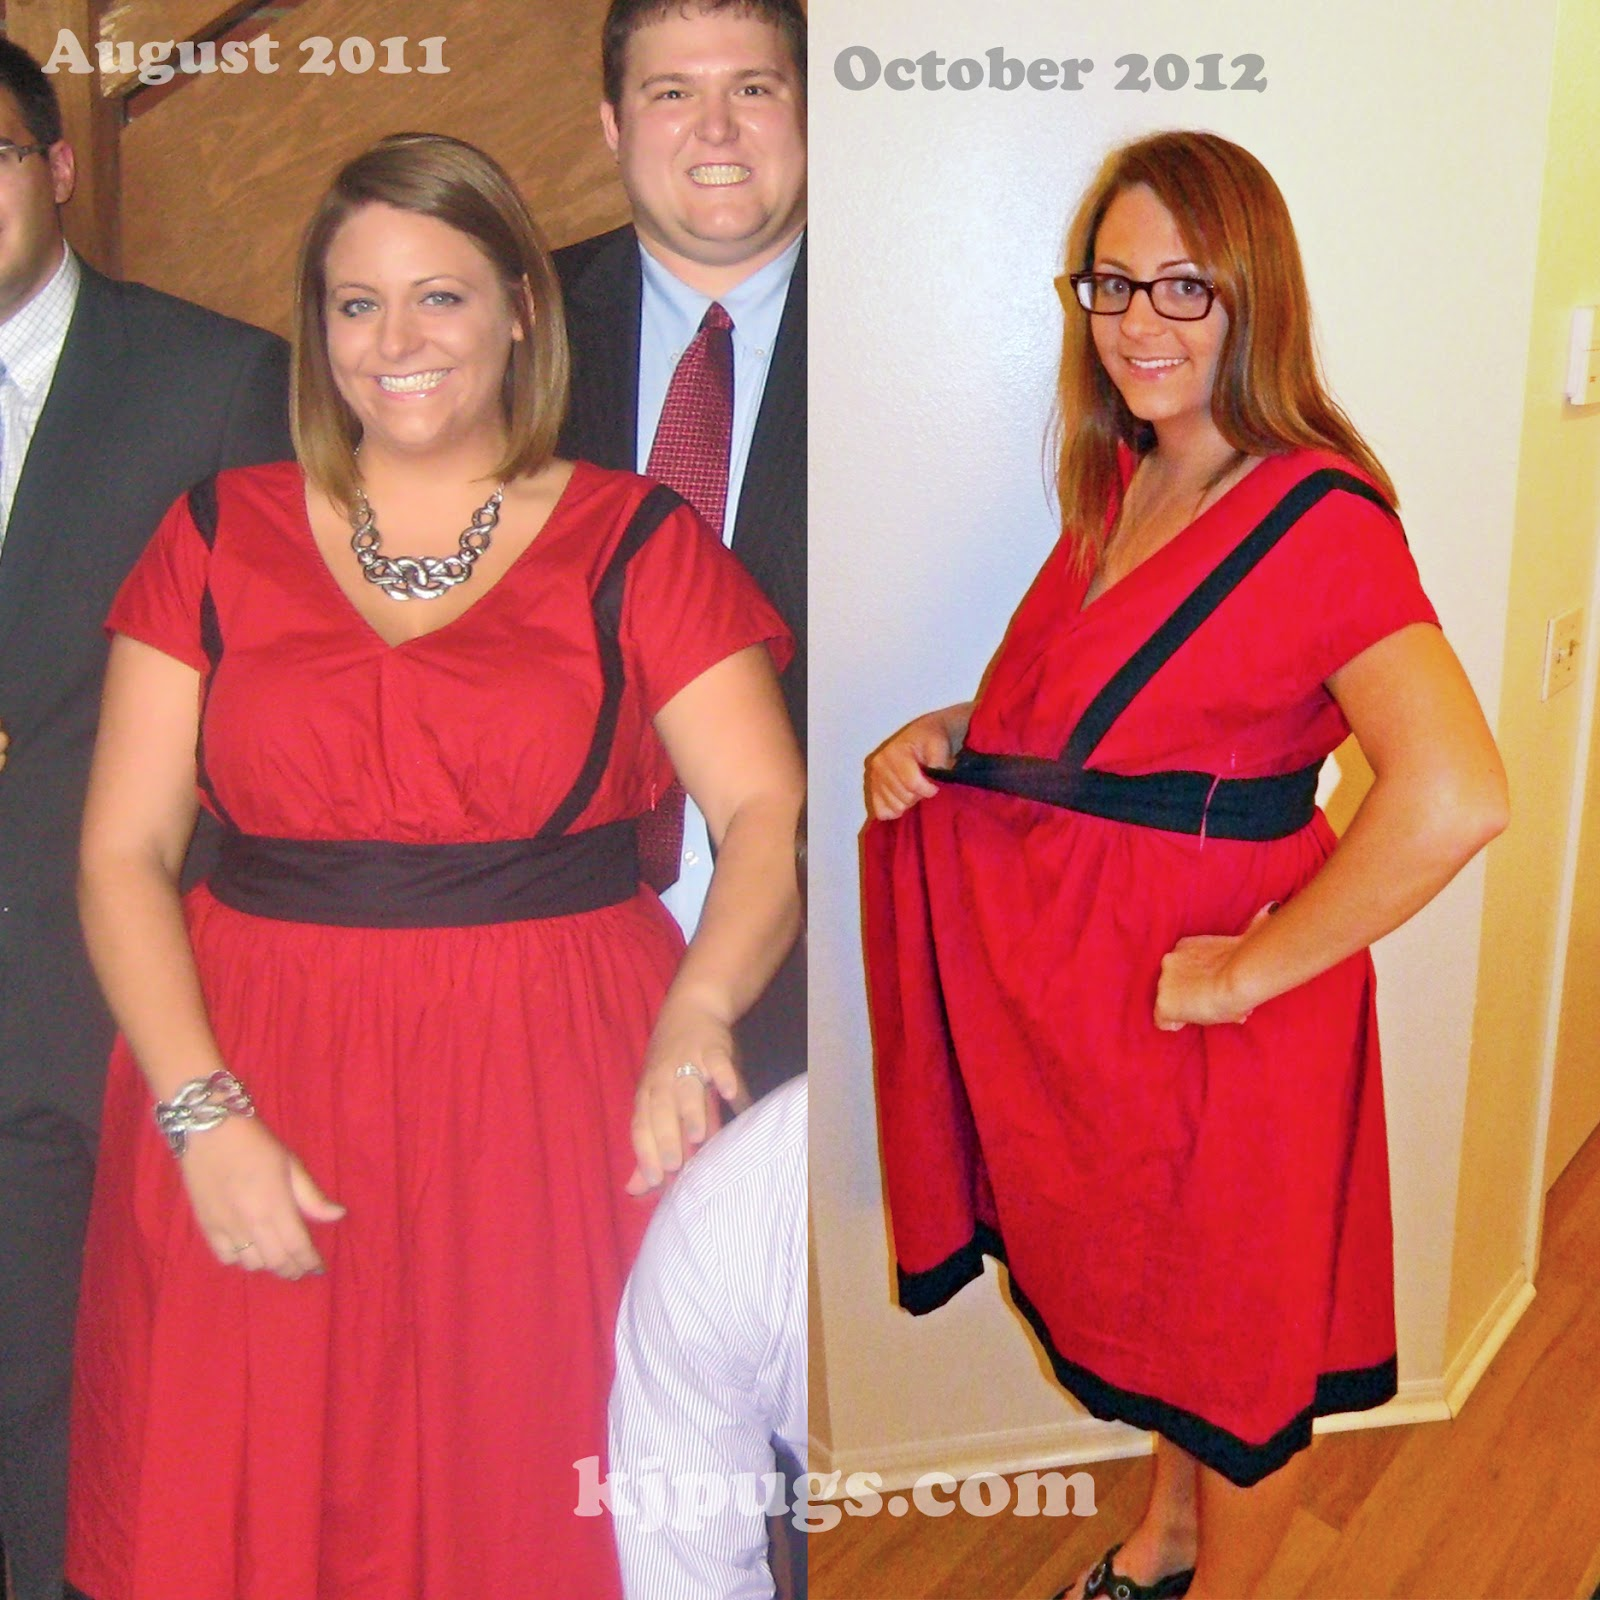 Stacey Halprin s viaje de pérdida de peso